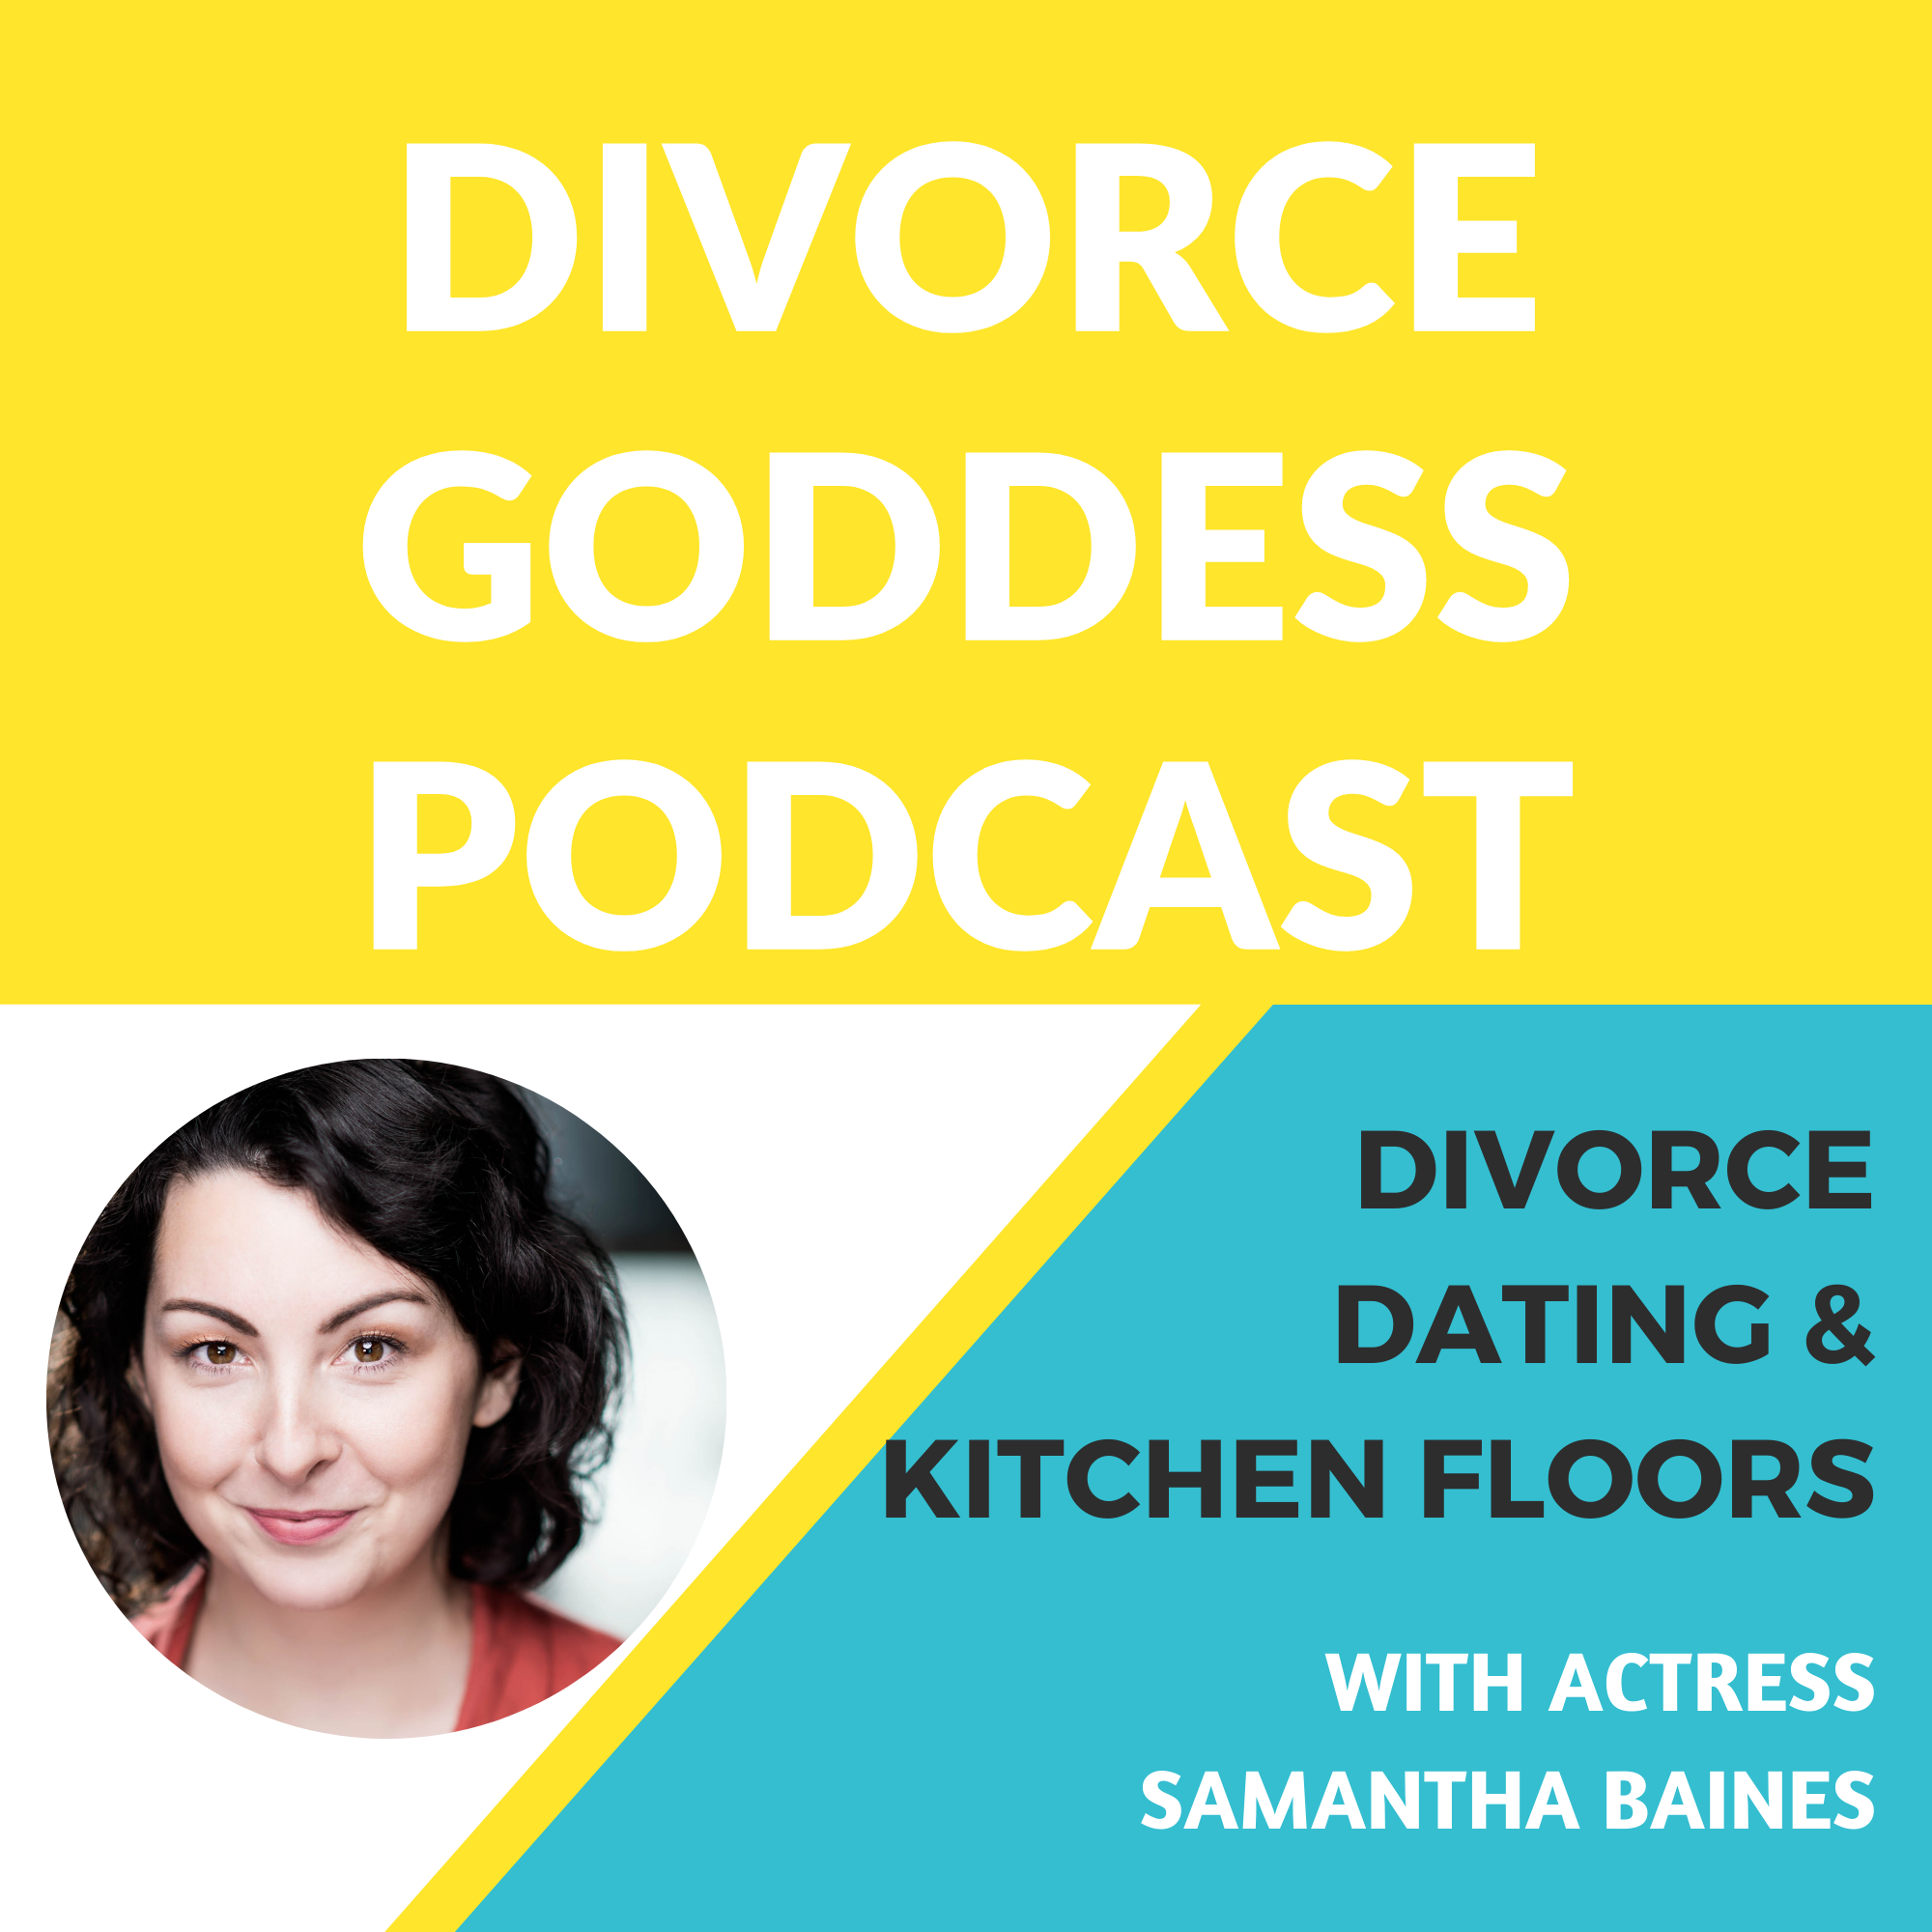 Divorce Goddess Podcast - Divorce, Dating & the Kitchen Floor with Samantha Baines